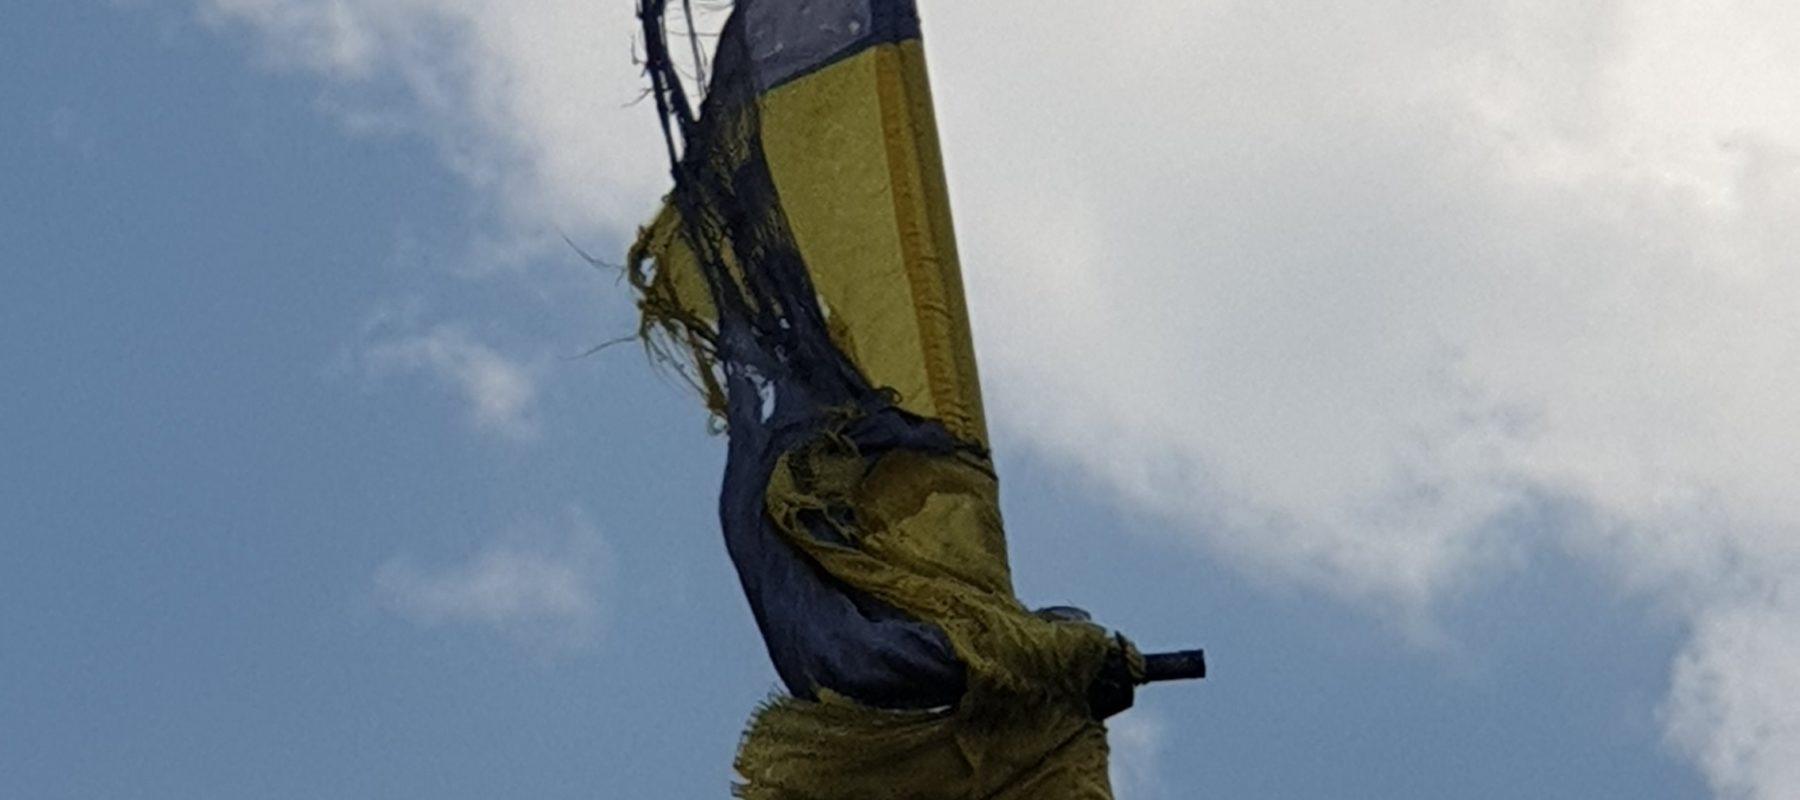 Флаг на крыше. Припять